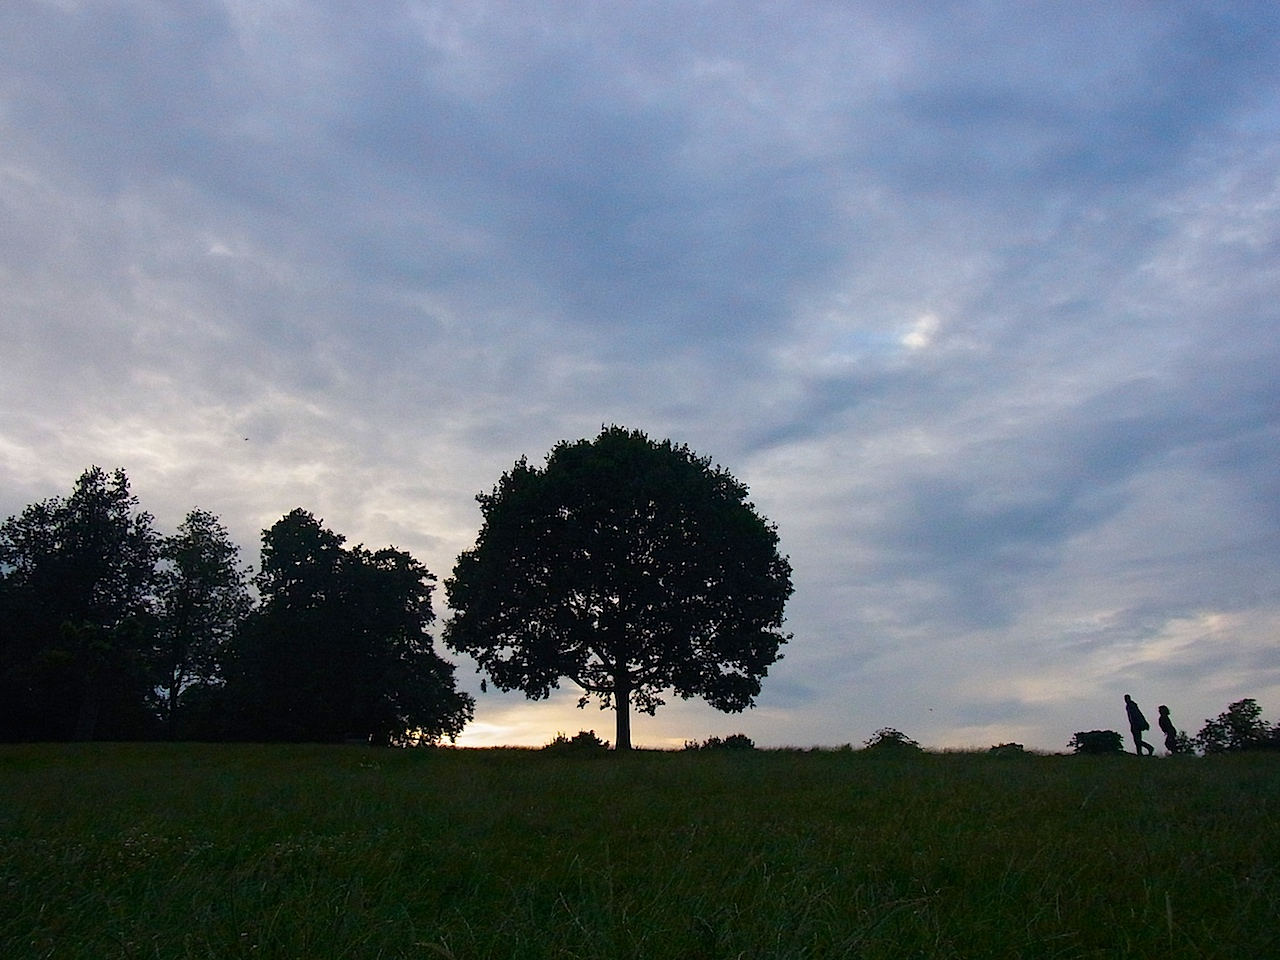 treeforest1.jpg